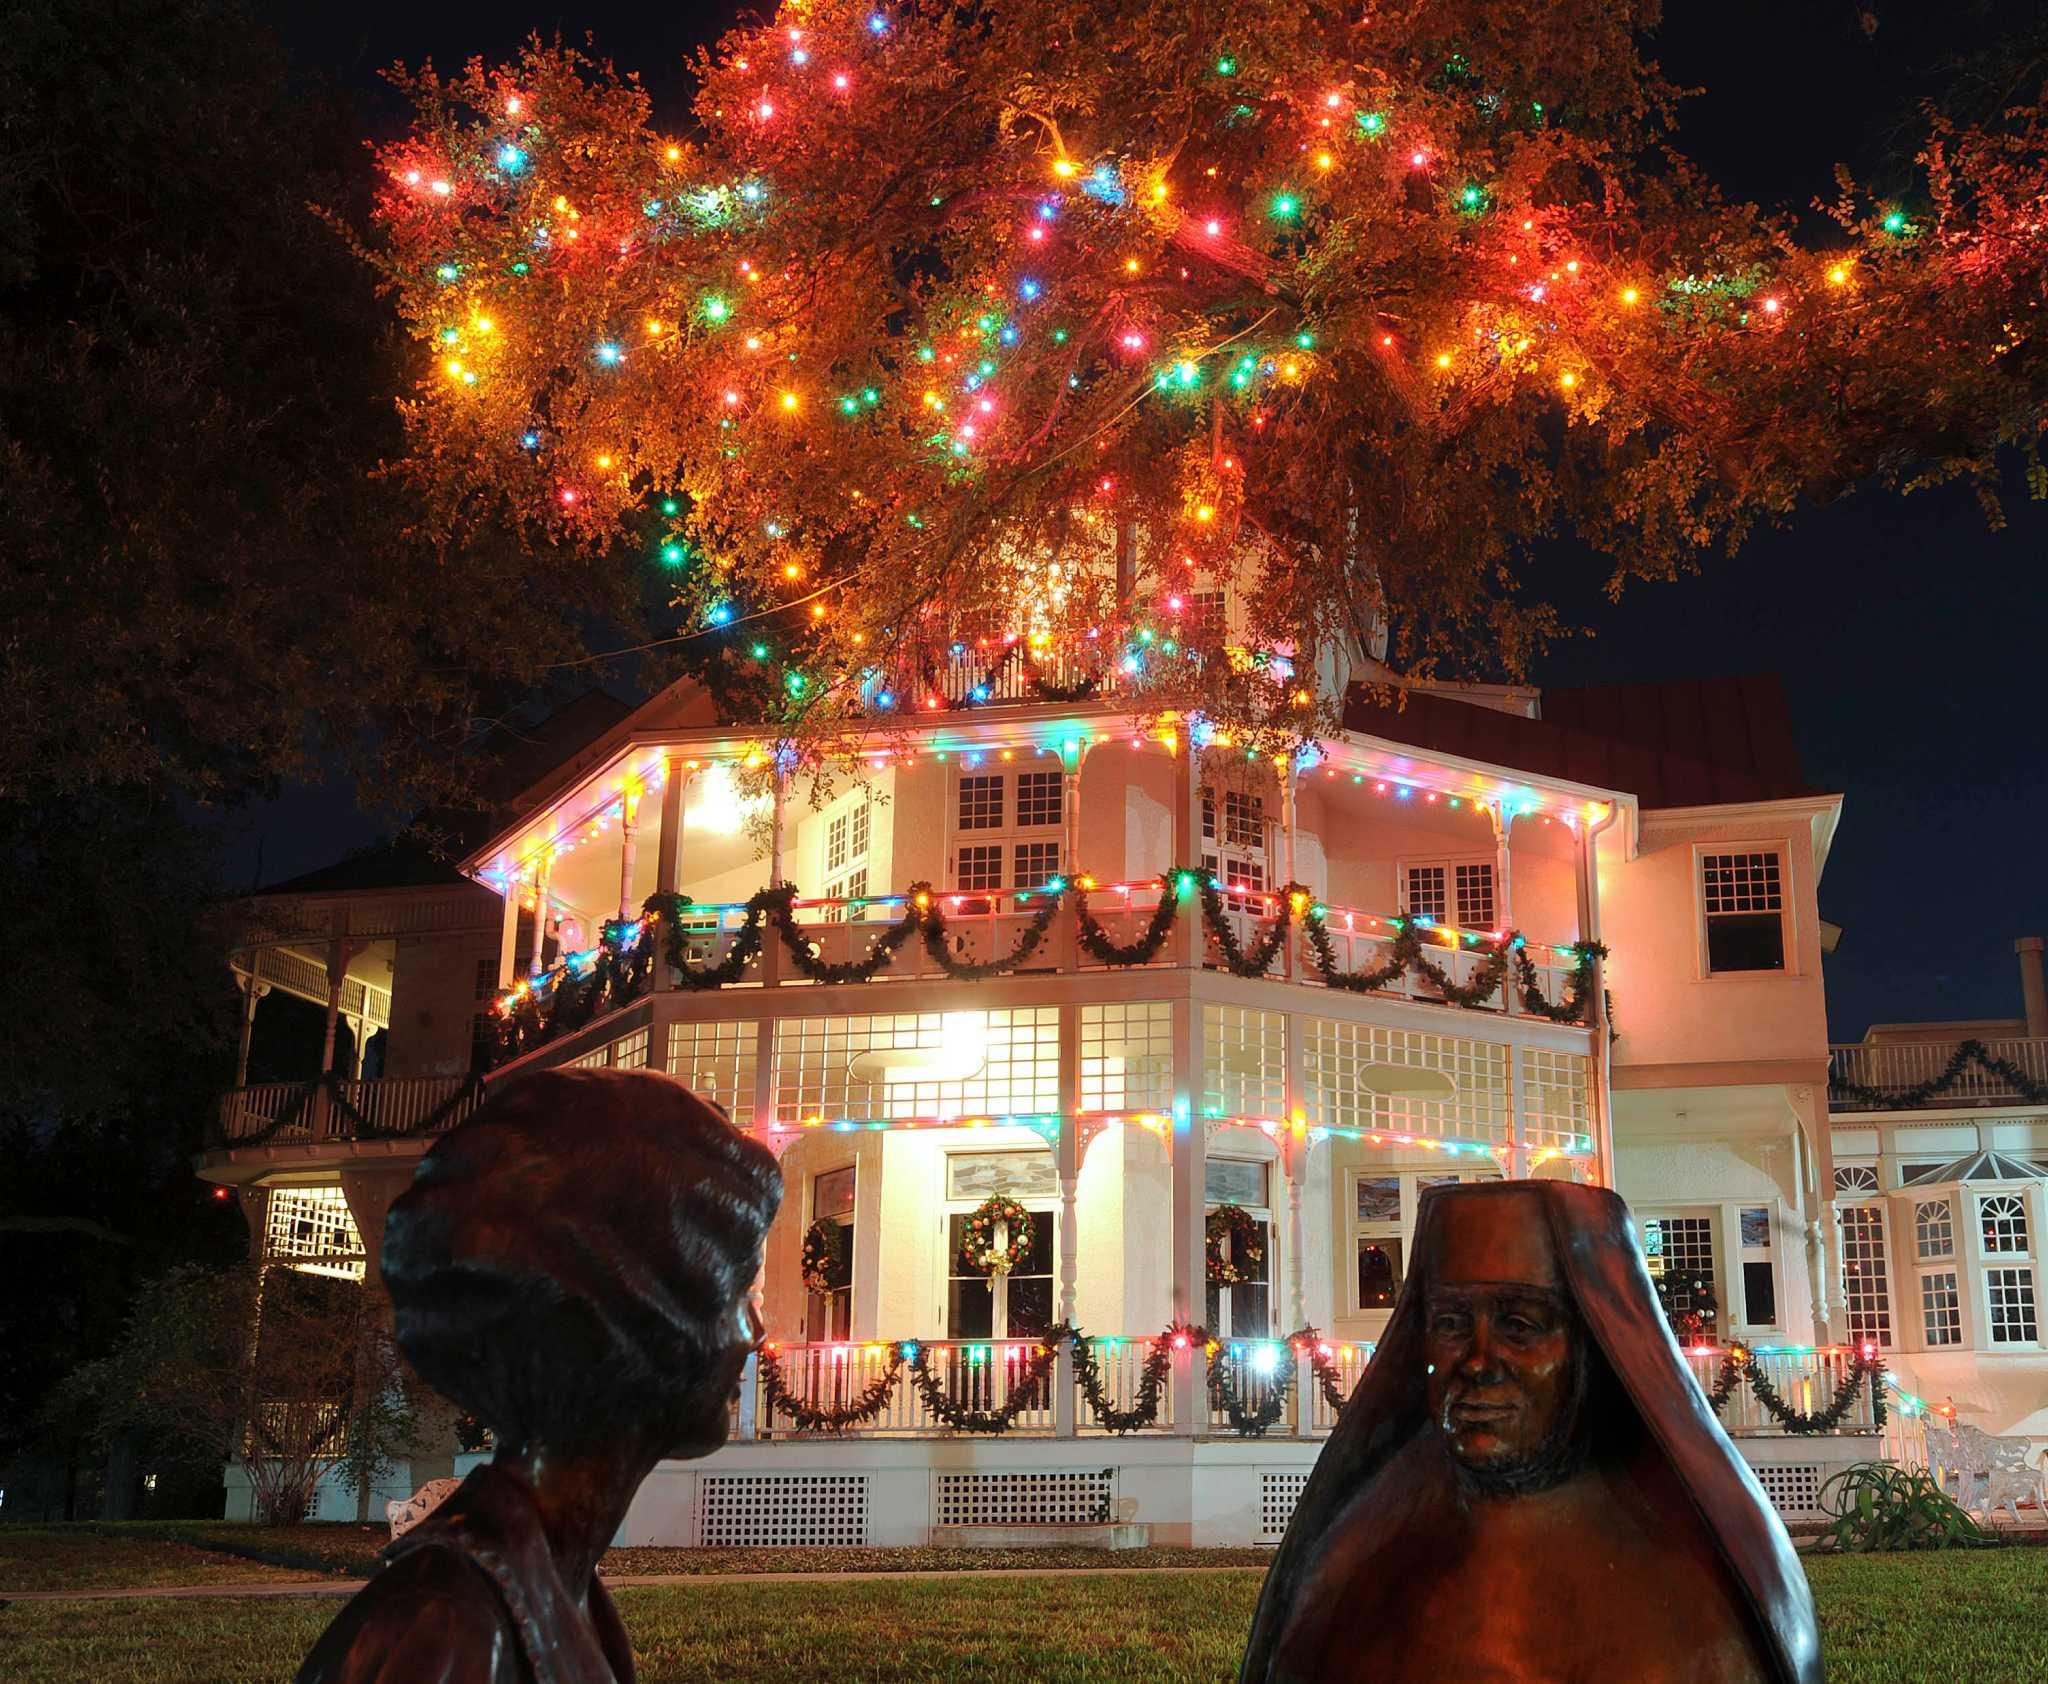 Incarnate Word Christmas Lights 2020 Christmas lights at University of Incarnate Word